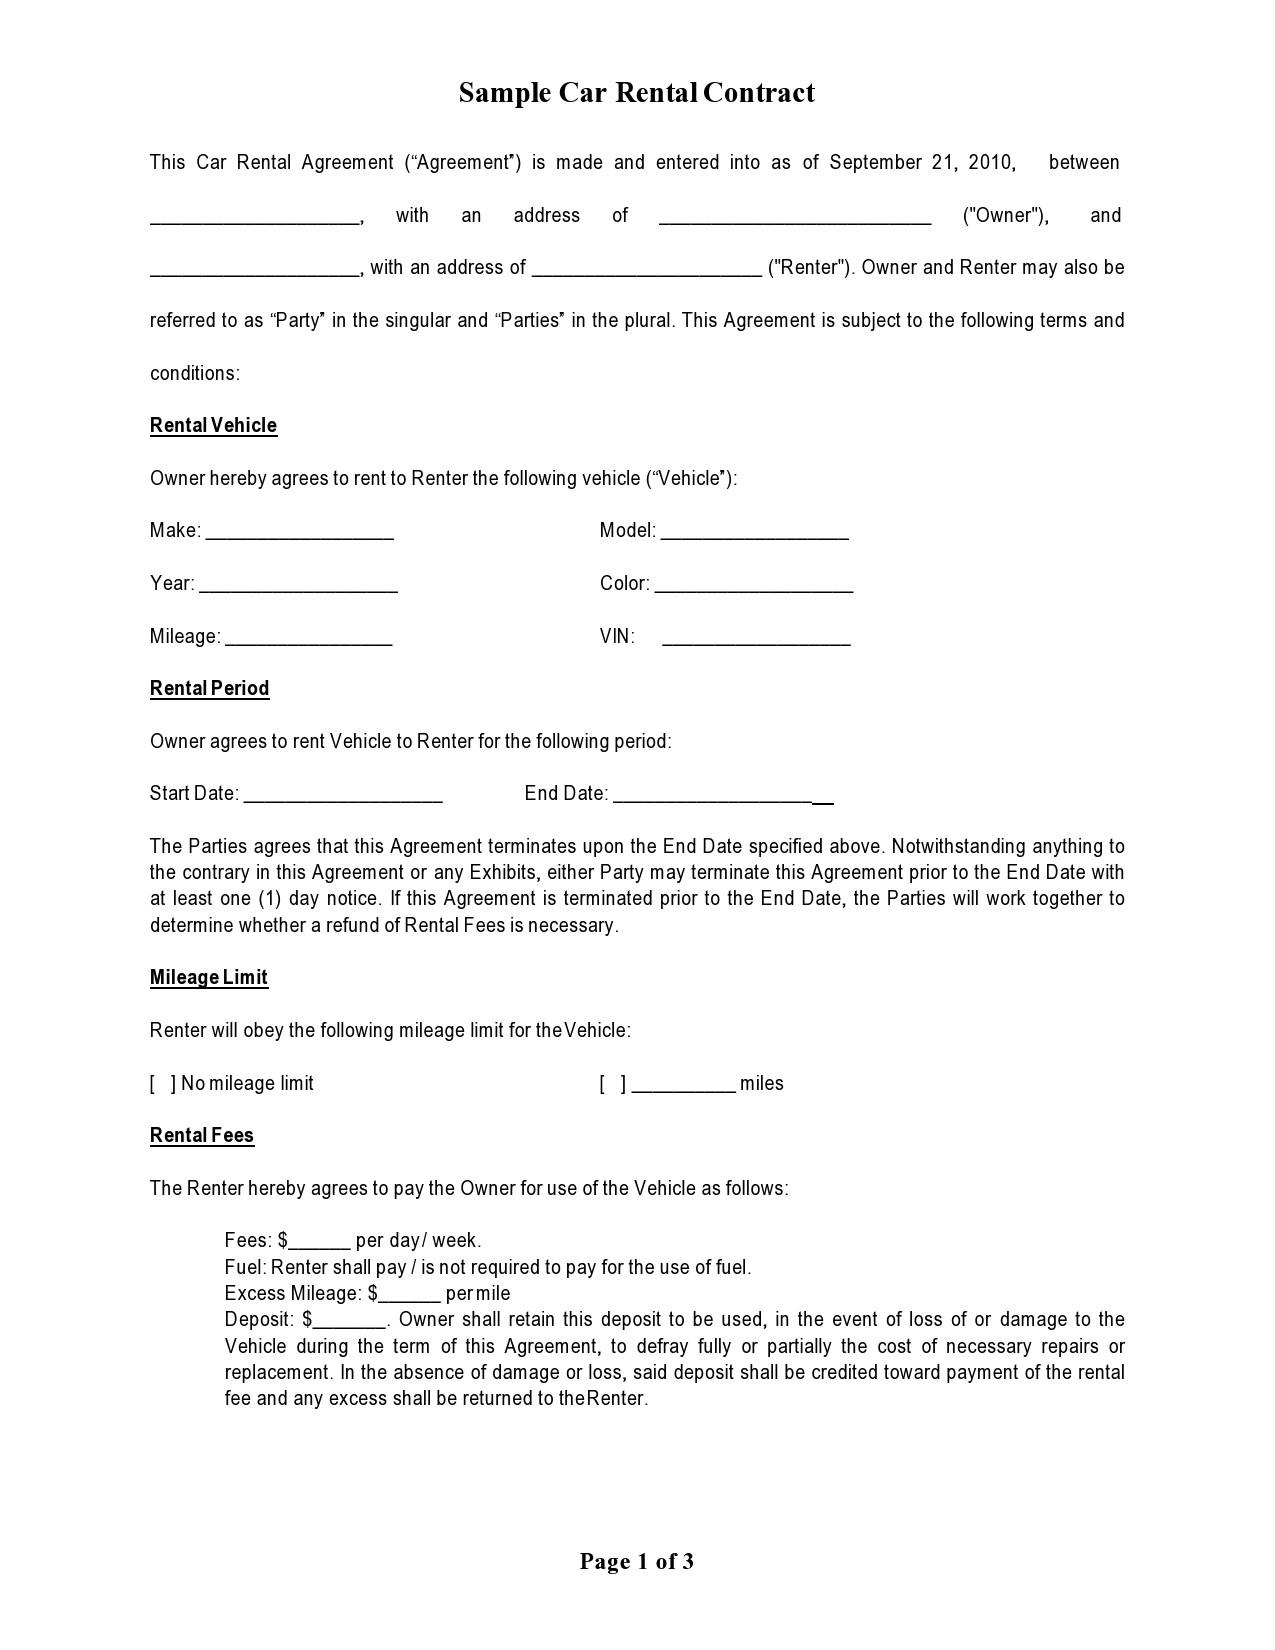 Free car rental agreement 05